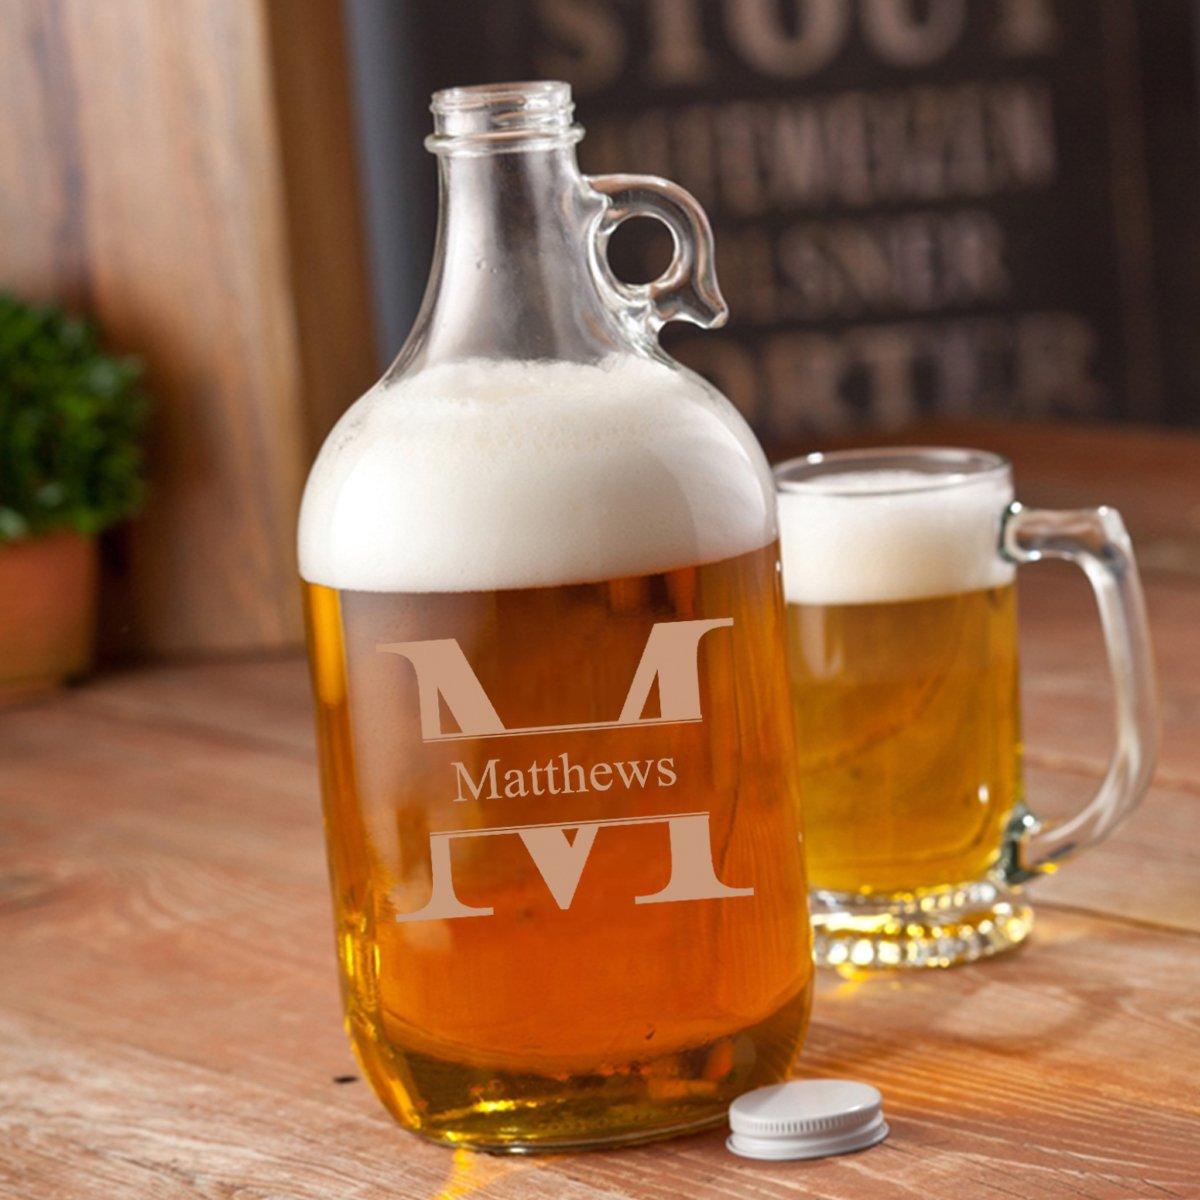 Personalized Stamped Monogrammed Glass Beer Growler - Personalized Beer Growler - Engraved Groomsmen Beer Growler